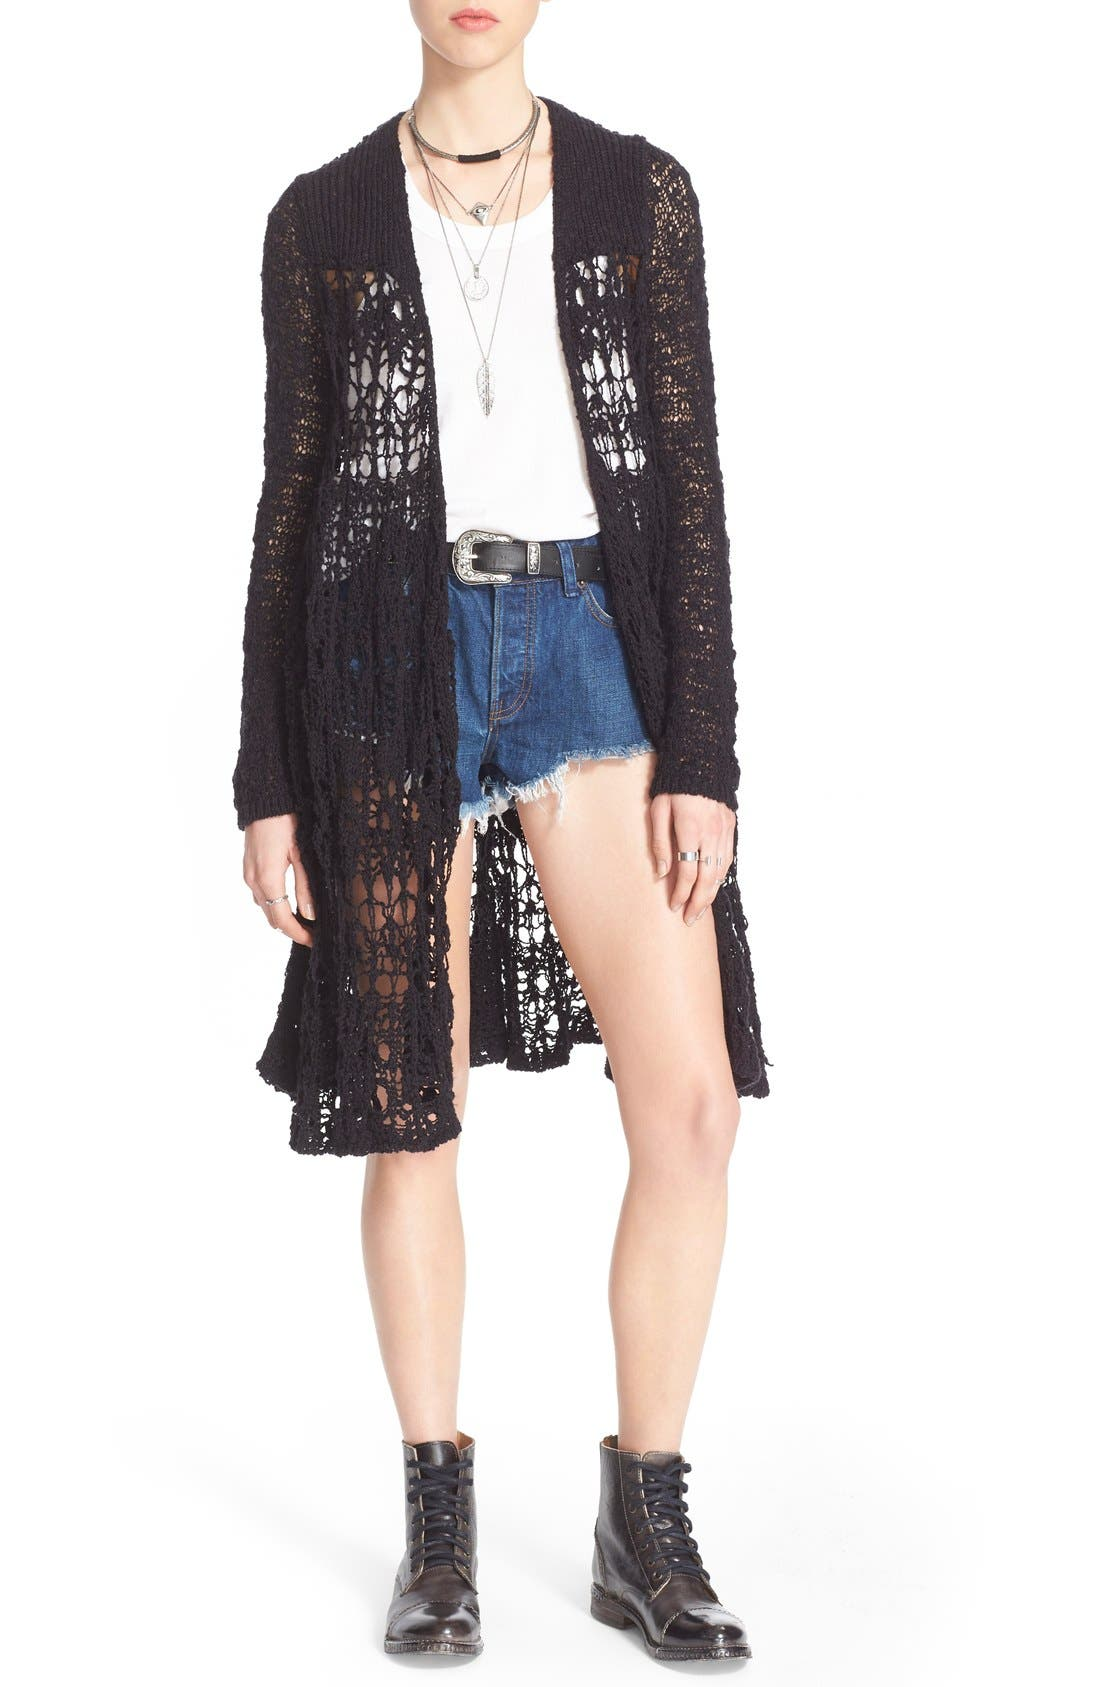 Alternate Image 1 Selected - Free People 'Sacred Geometry' Loose Knit Cardigan